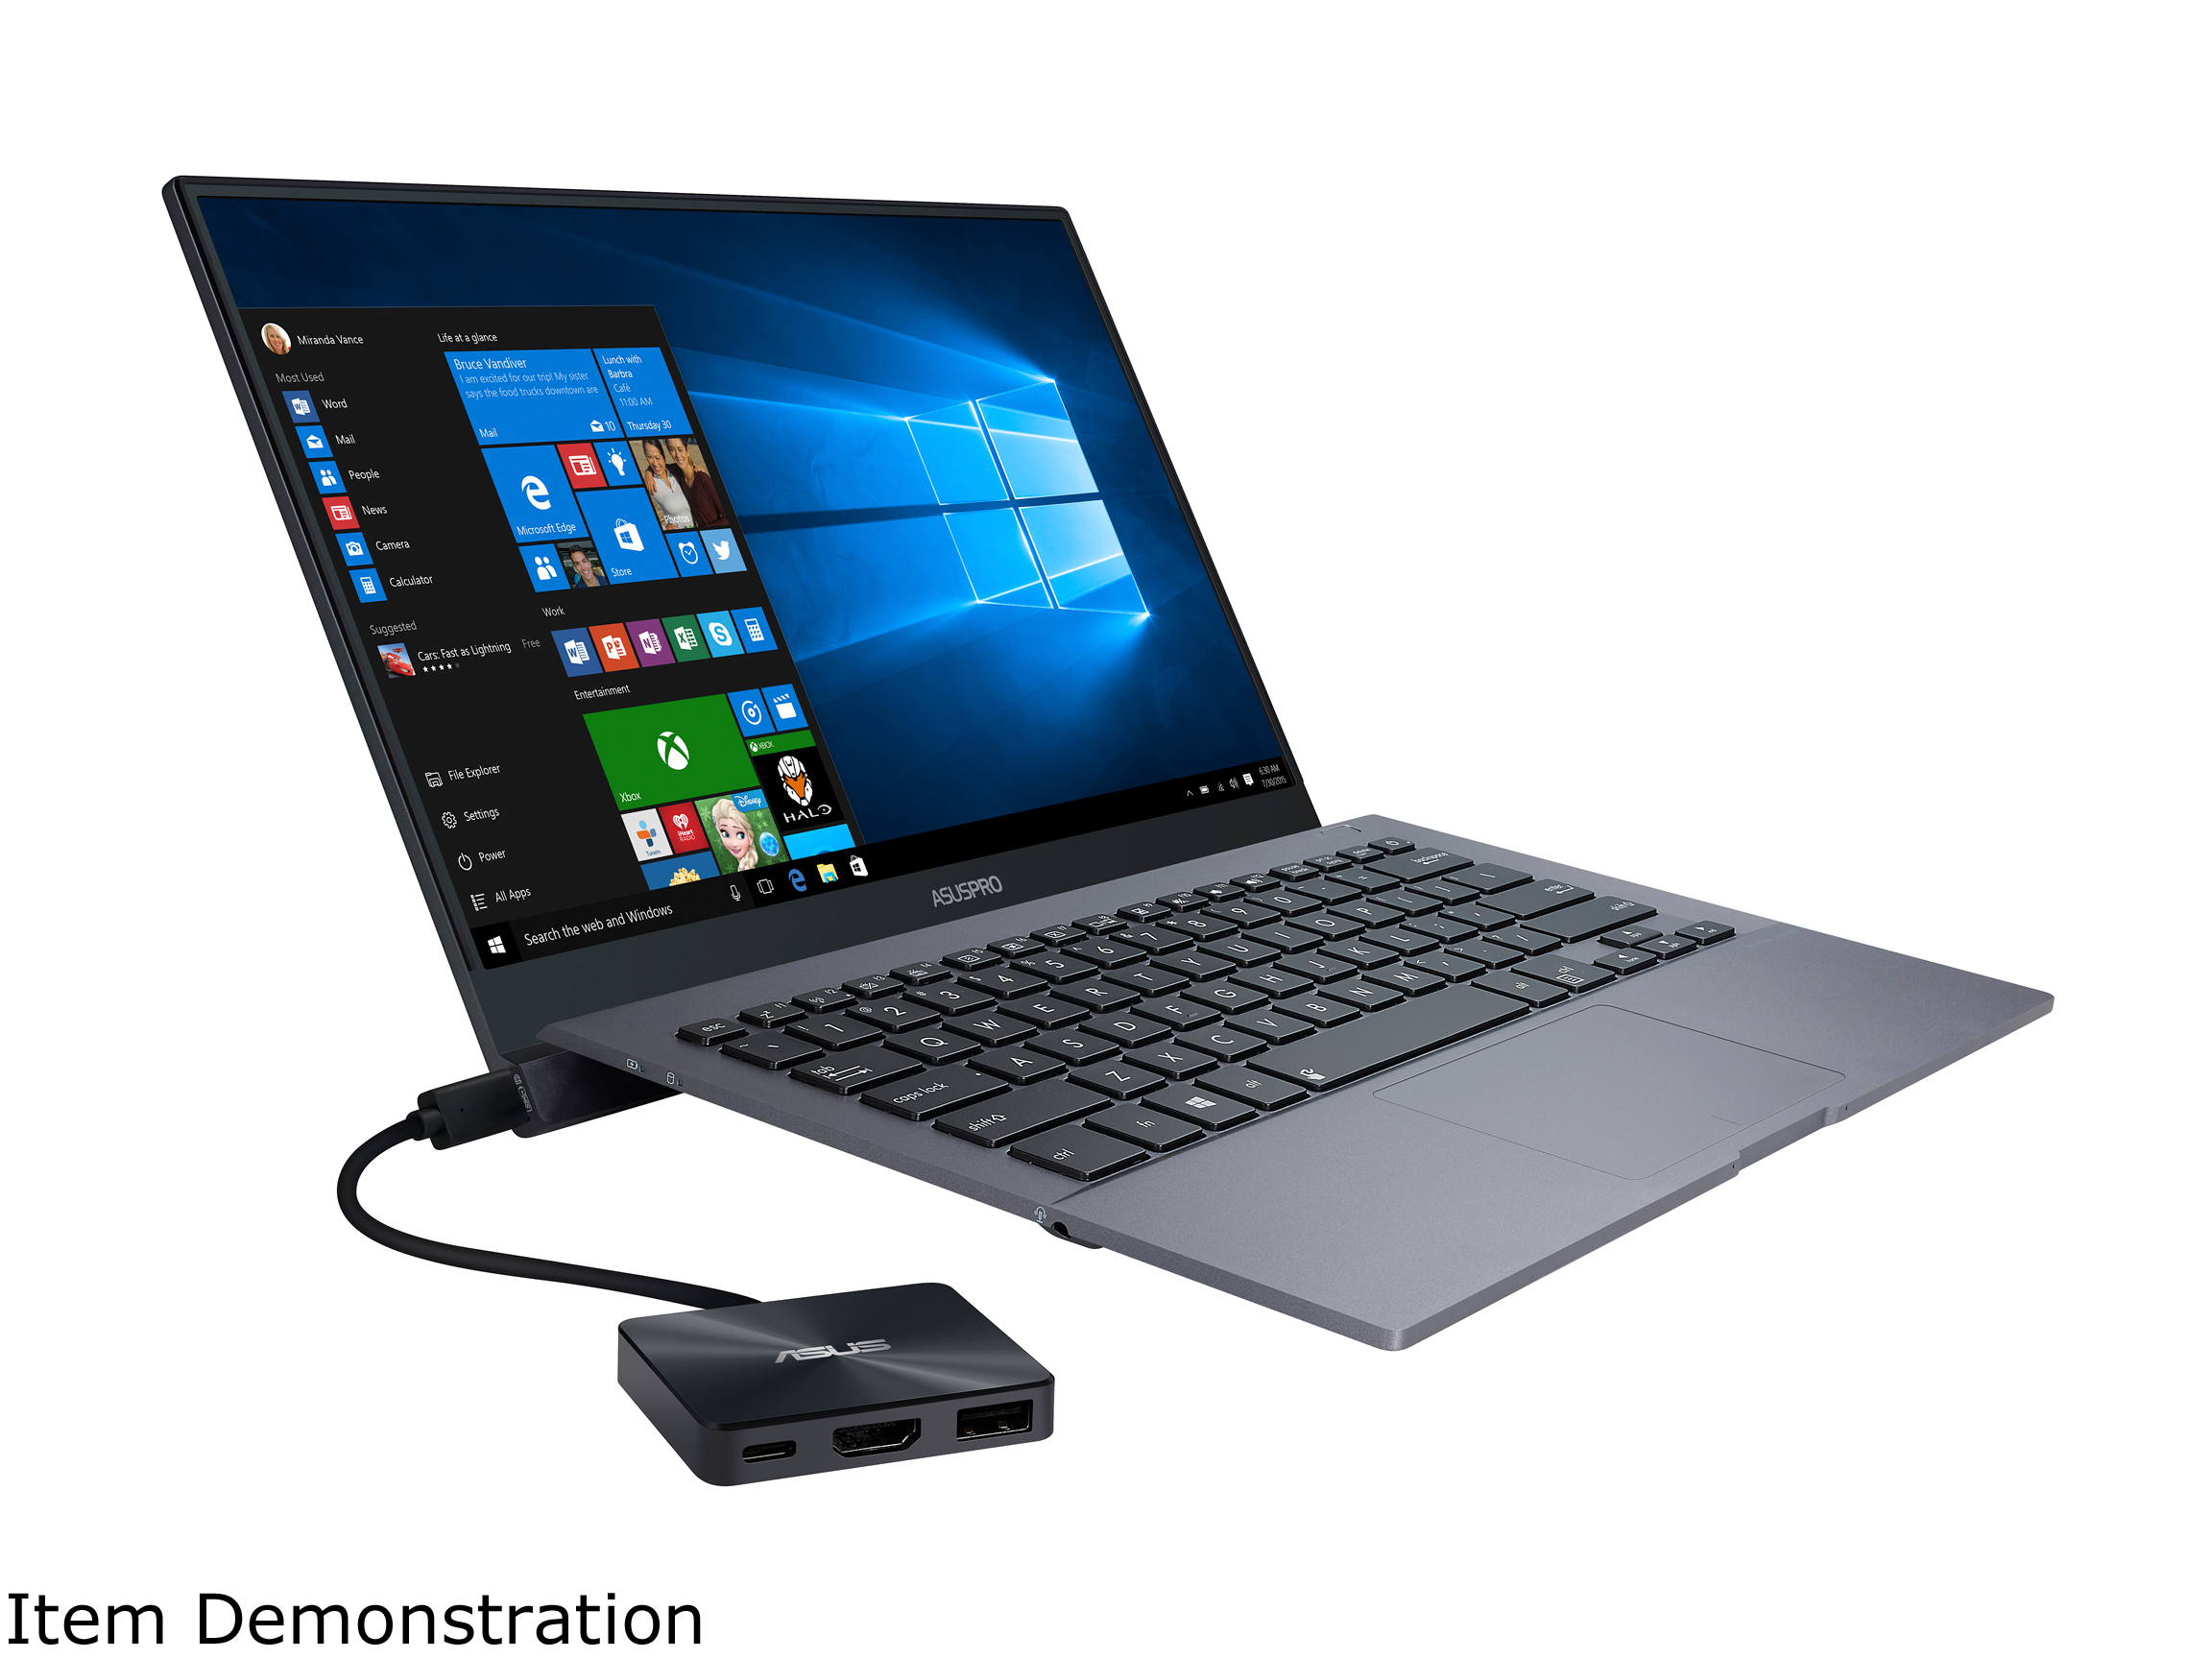 "ASUS PRO B9440 Ultra Thin and Light Business Laptop, 14"" Wideview Full HD Narrow Bezel Display, Intel Core i5-7200U 2.5 GHz Processor, 512GB SSD, 8GB RAM, Windows 10 Pro, Fingerprint, 10hrs battery life"